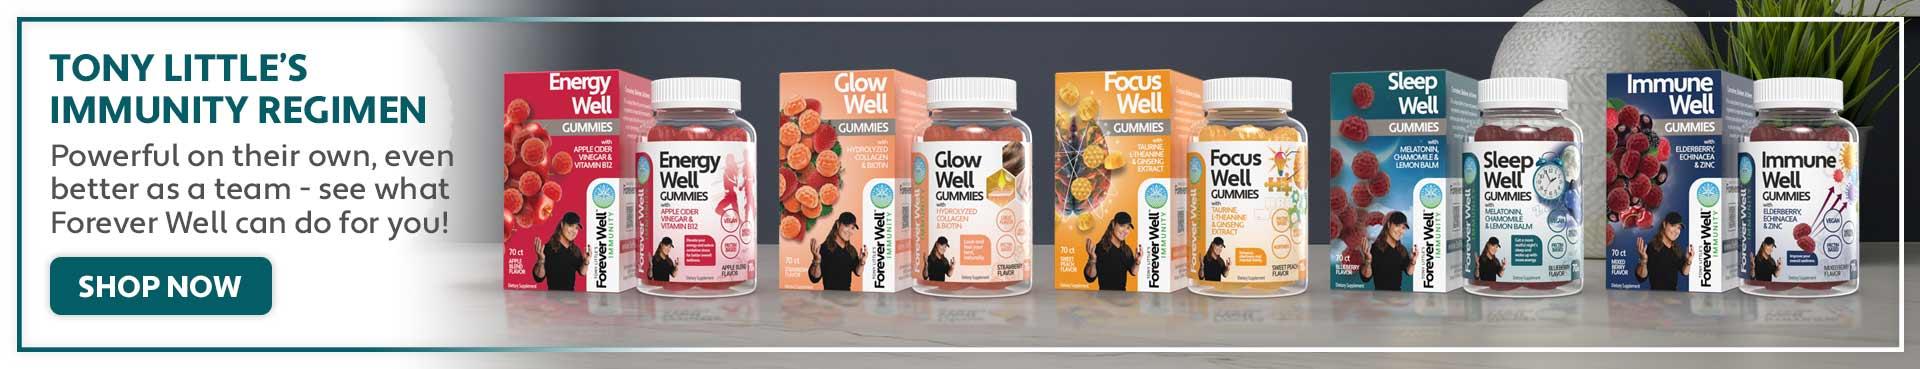 Wellness Products Regimen